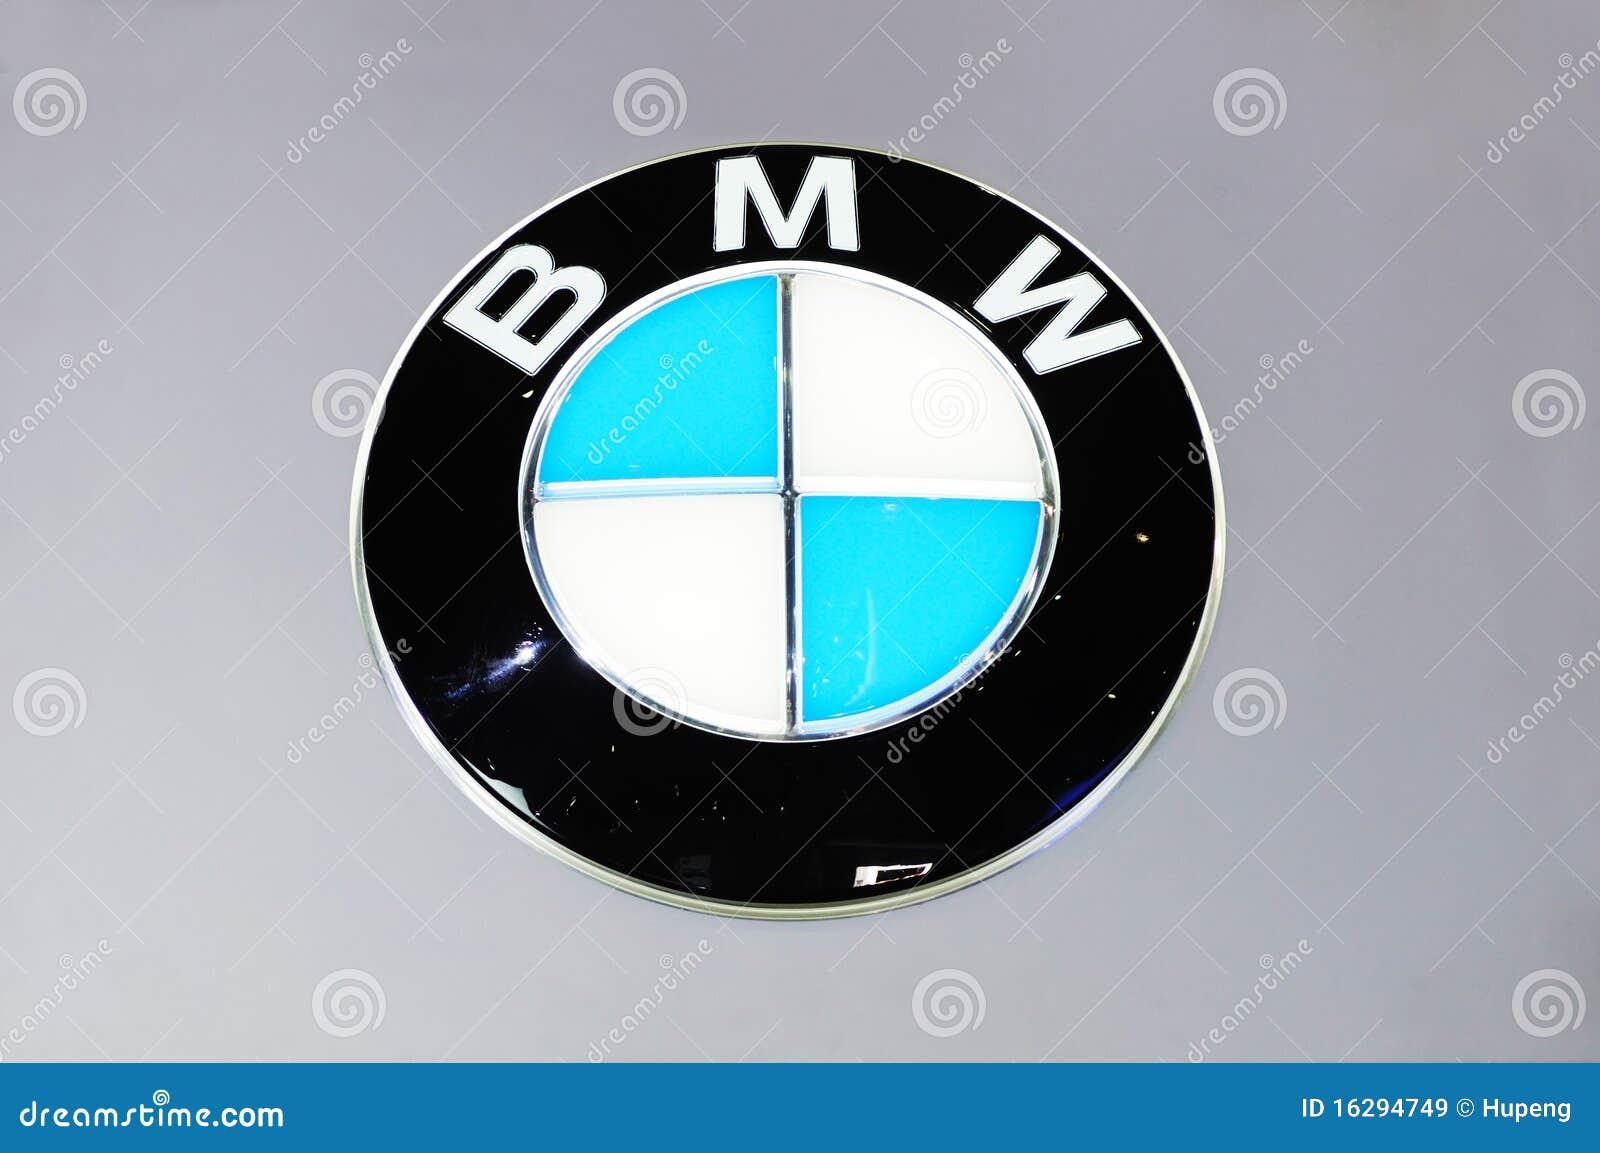 bmw logo editorial stock image